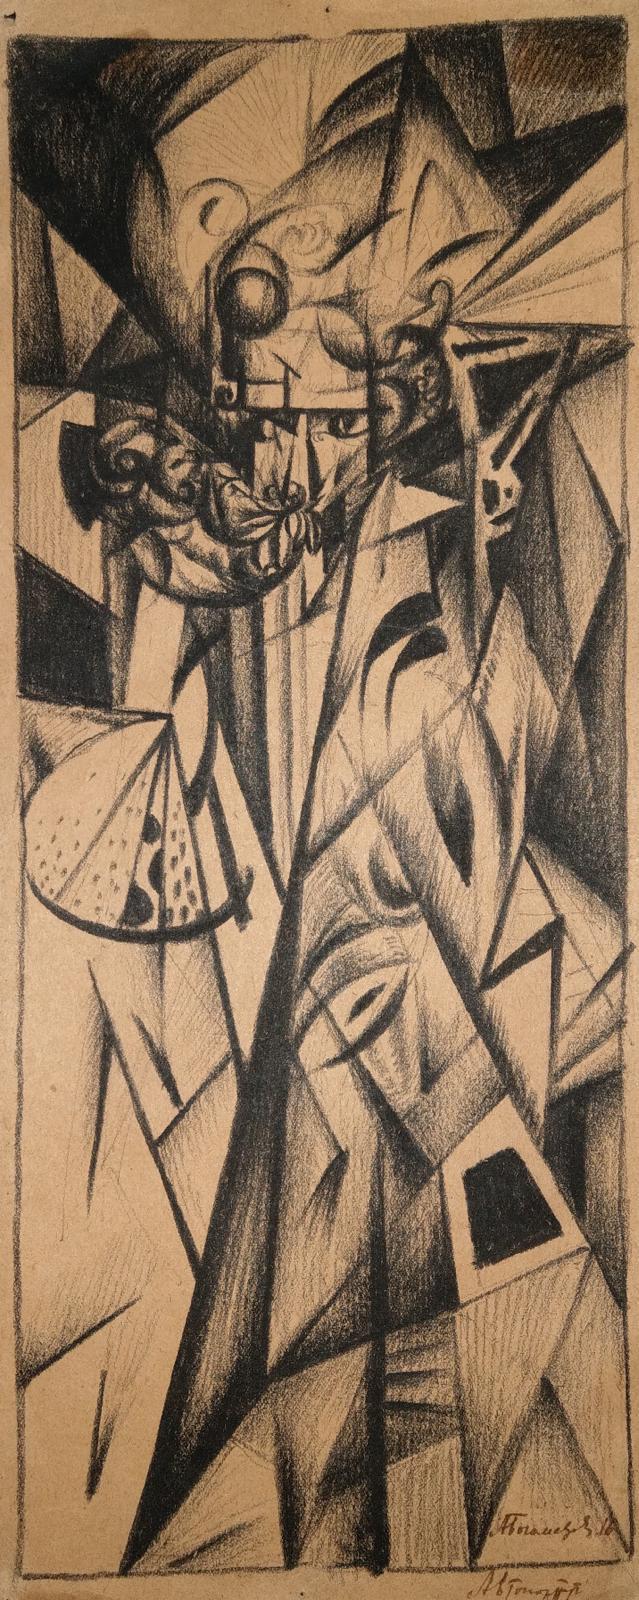 Self Portrait, 1916 - Alexander Bogomazov